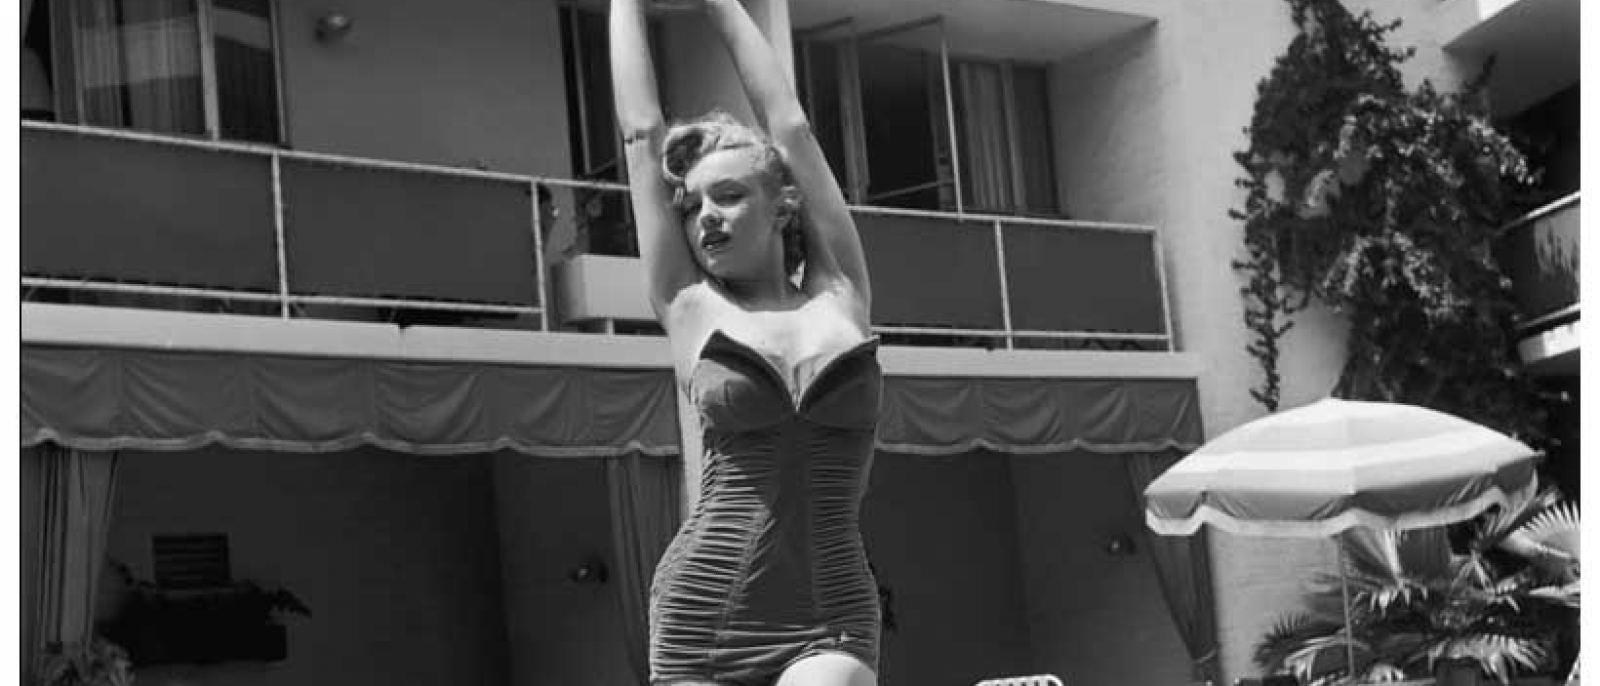 Marilyn Monroe at the Beverly Carlton Hotel (1951)